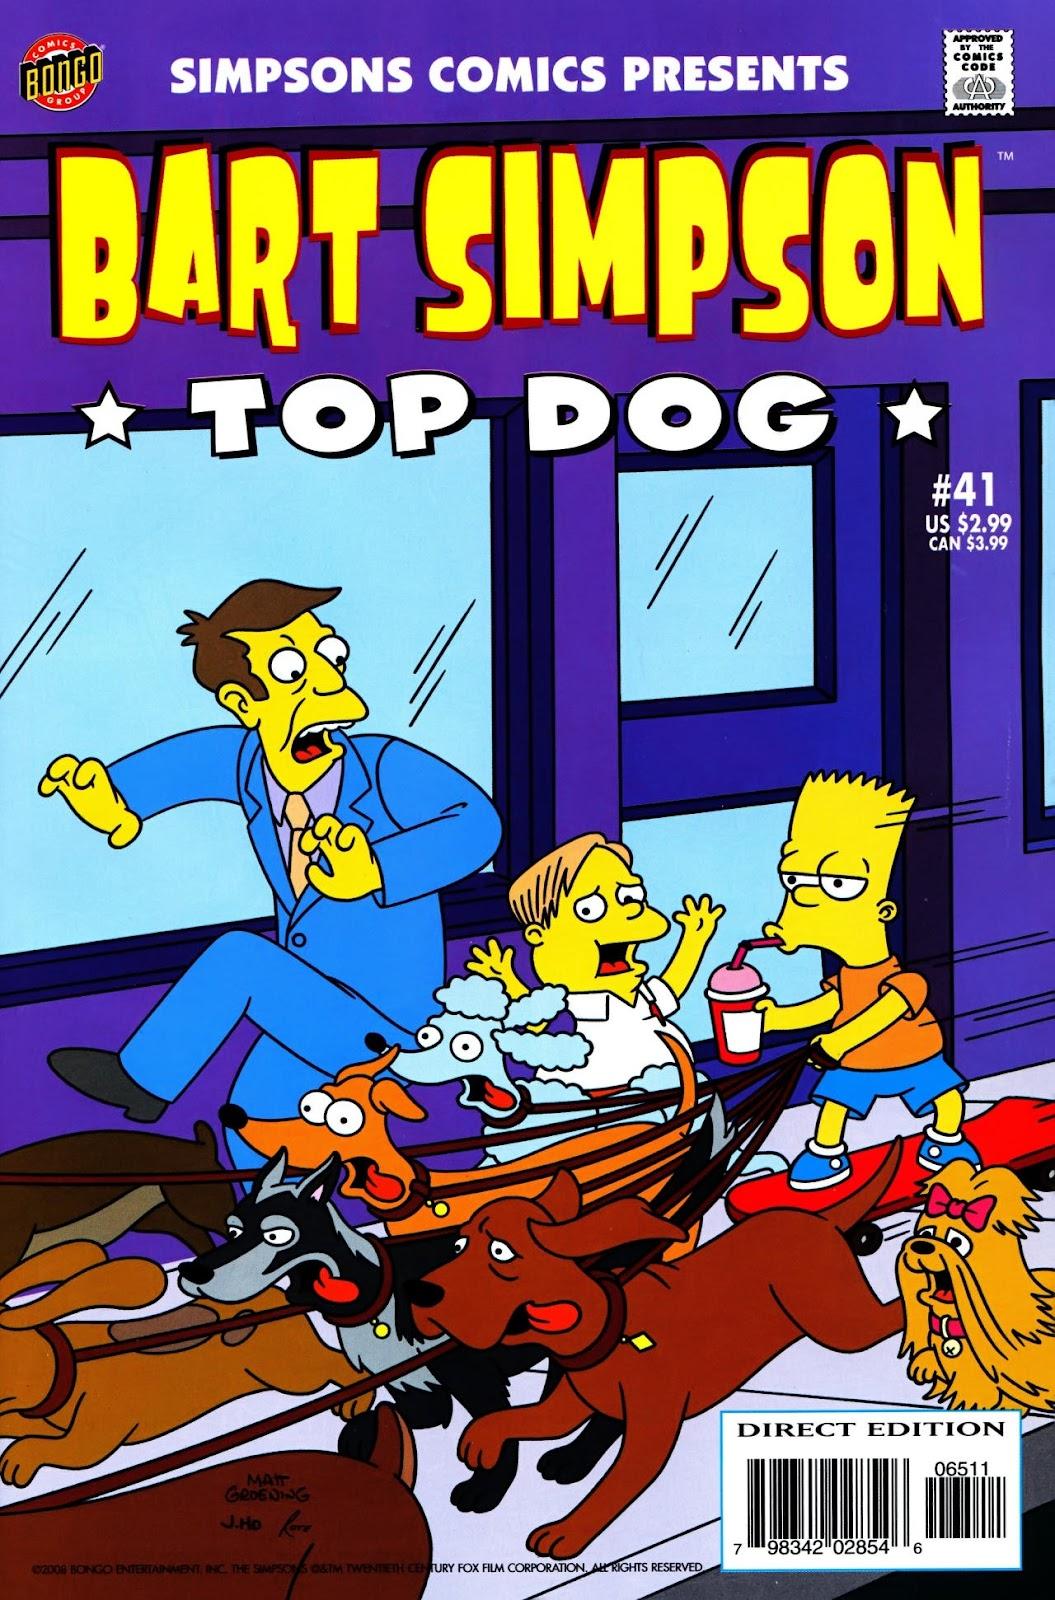 Simpsons Comics Presents Bart Simpson 41 Page 1